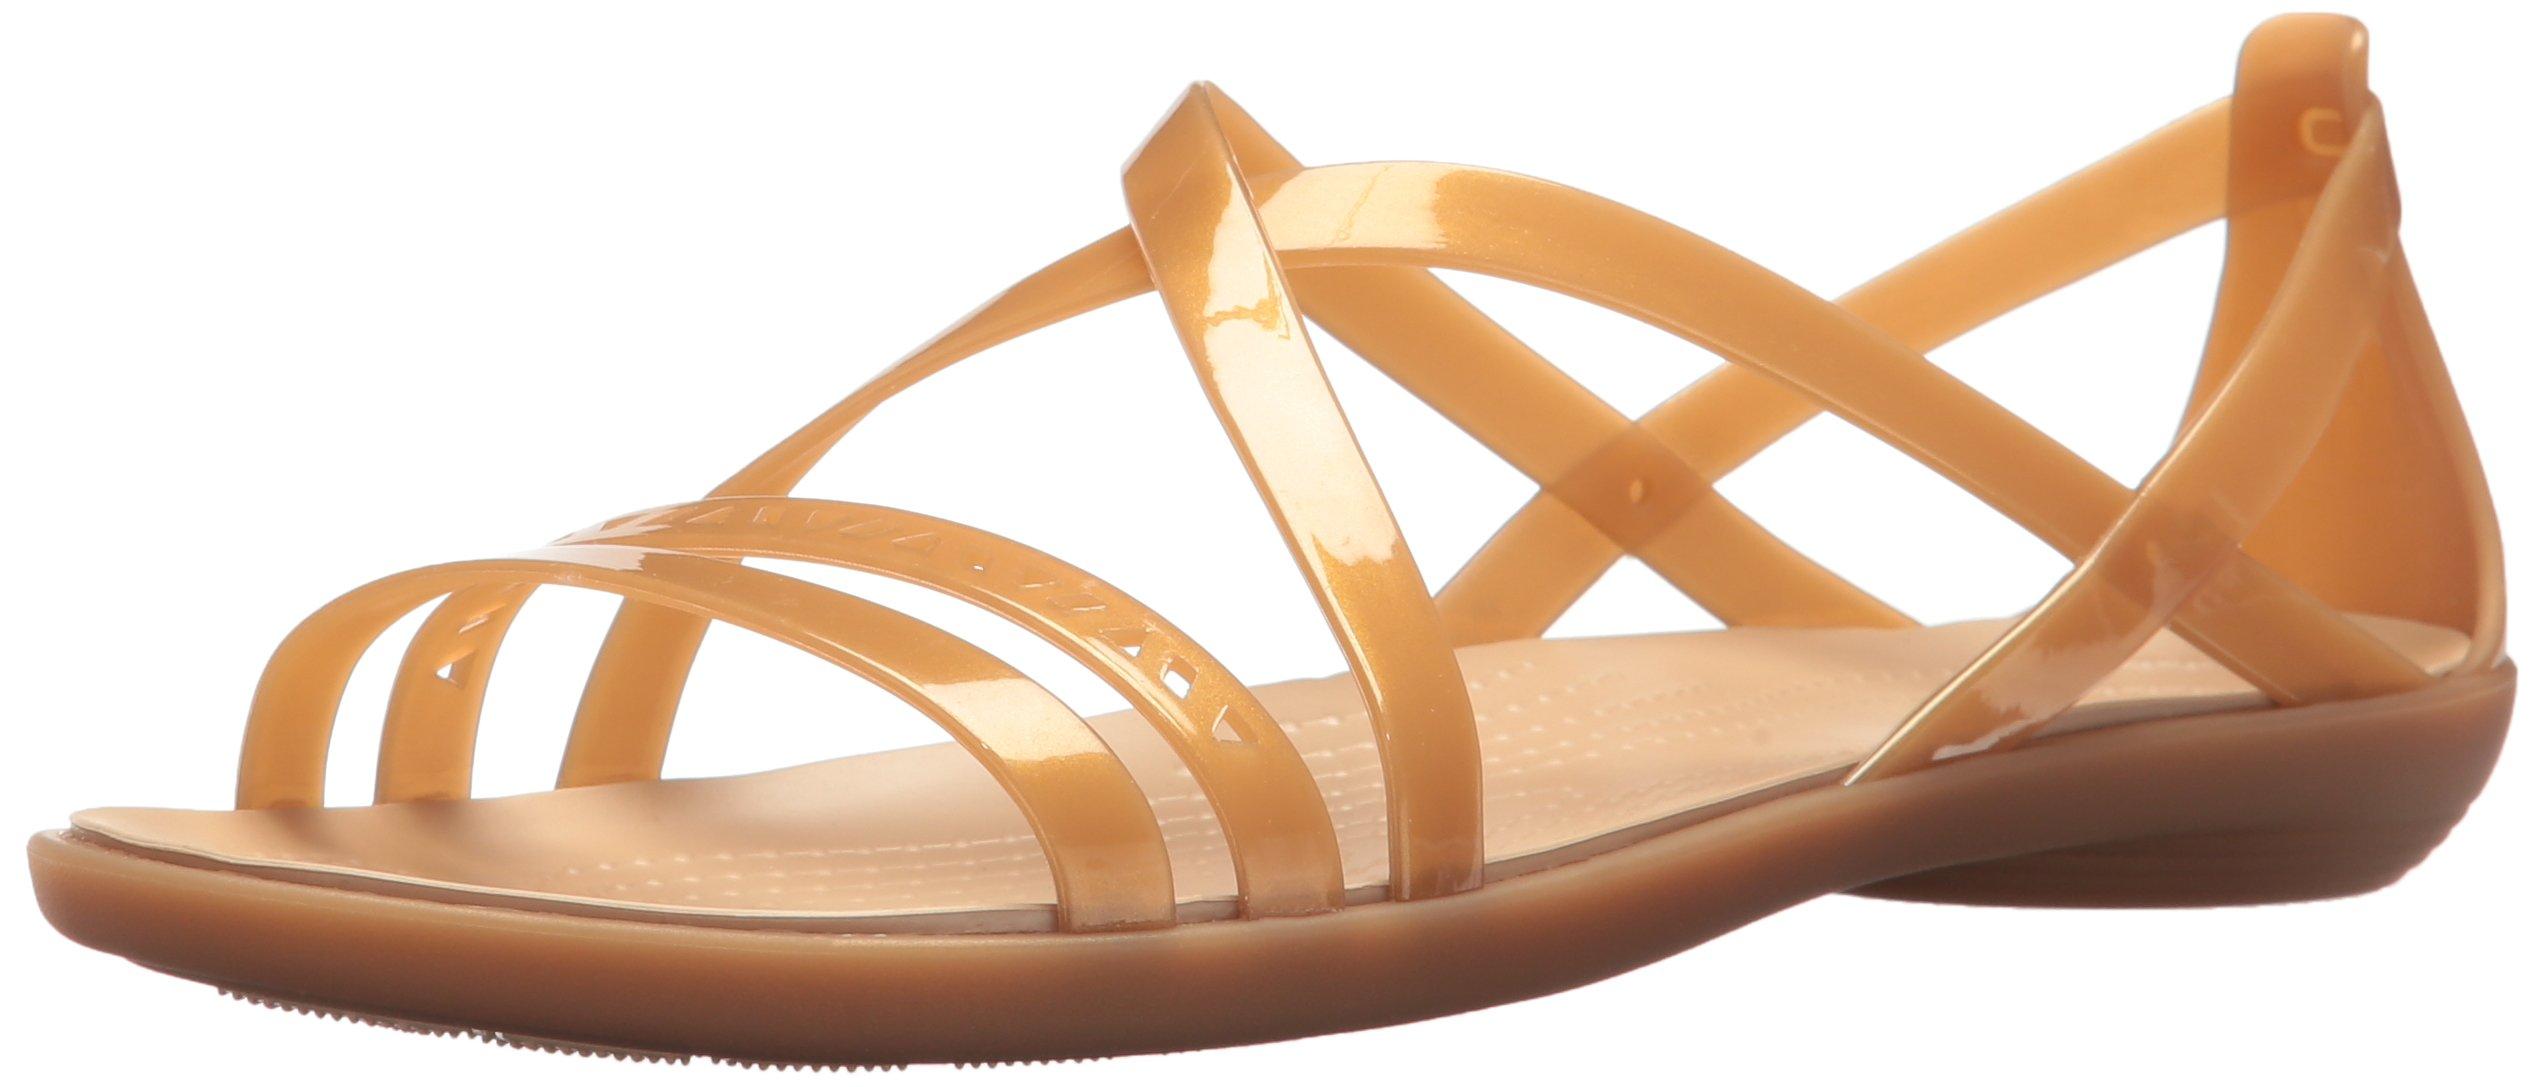 Crocs Women's Isabella Cut Strappy Sandal